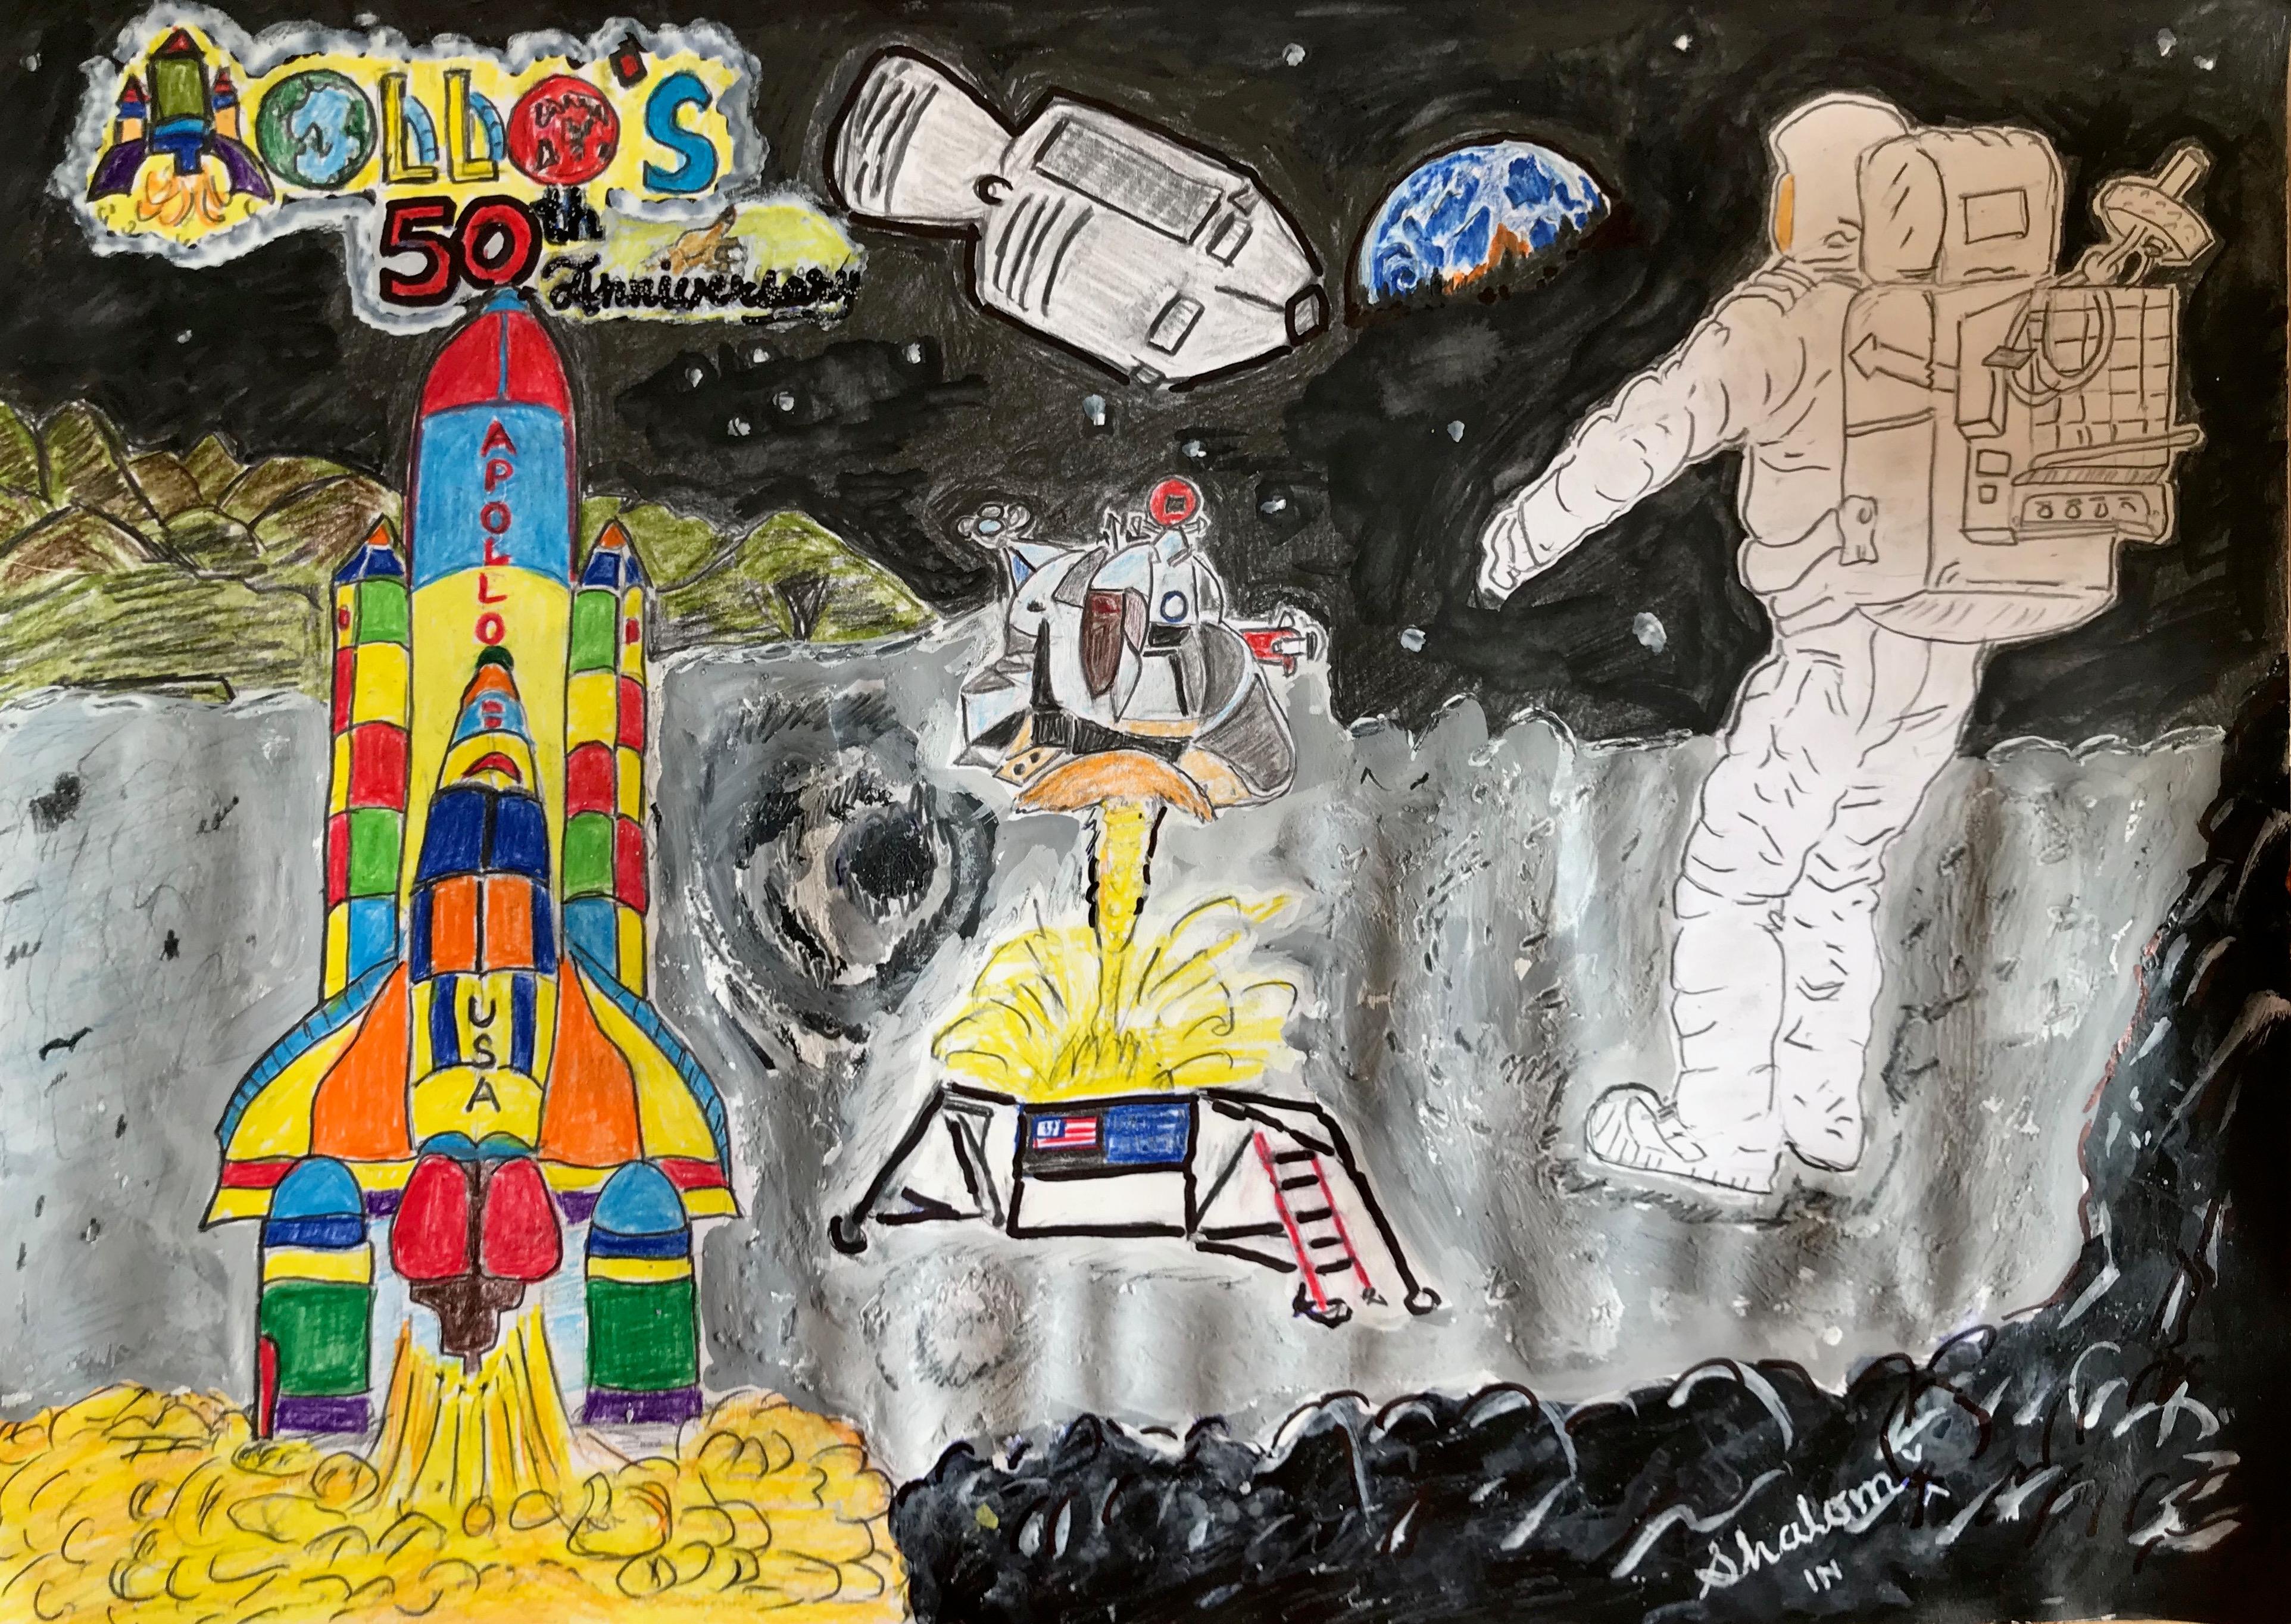 Shalom's Art On 'Apollo's 50th Anniversary'